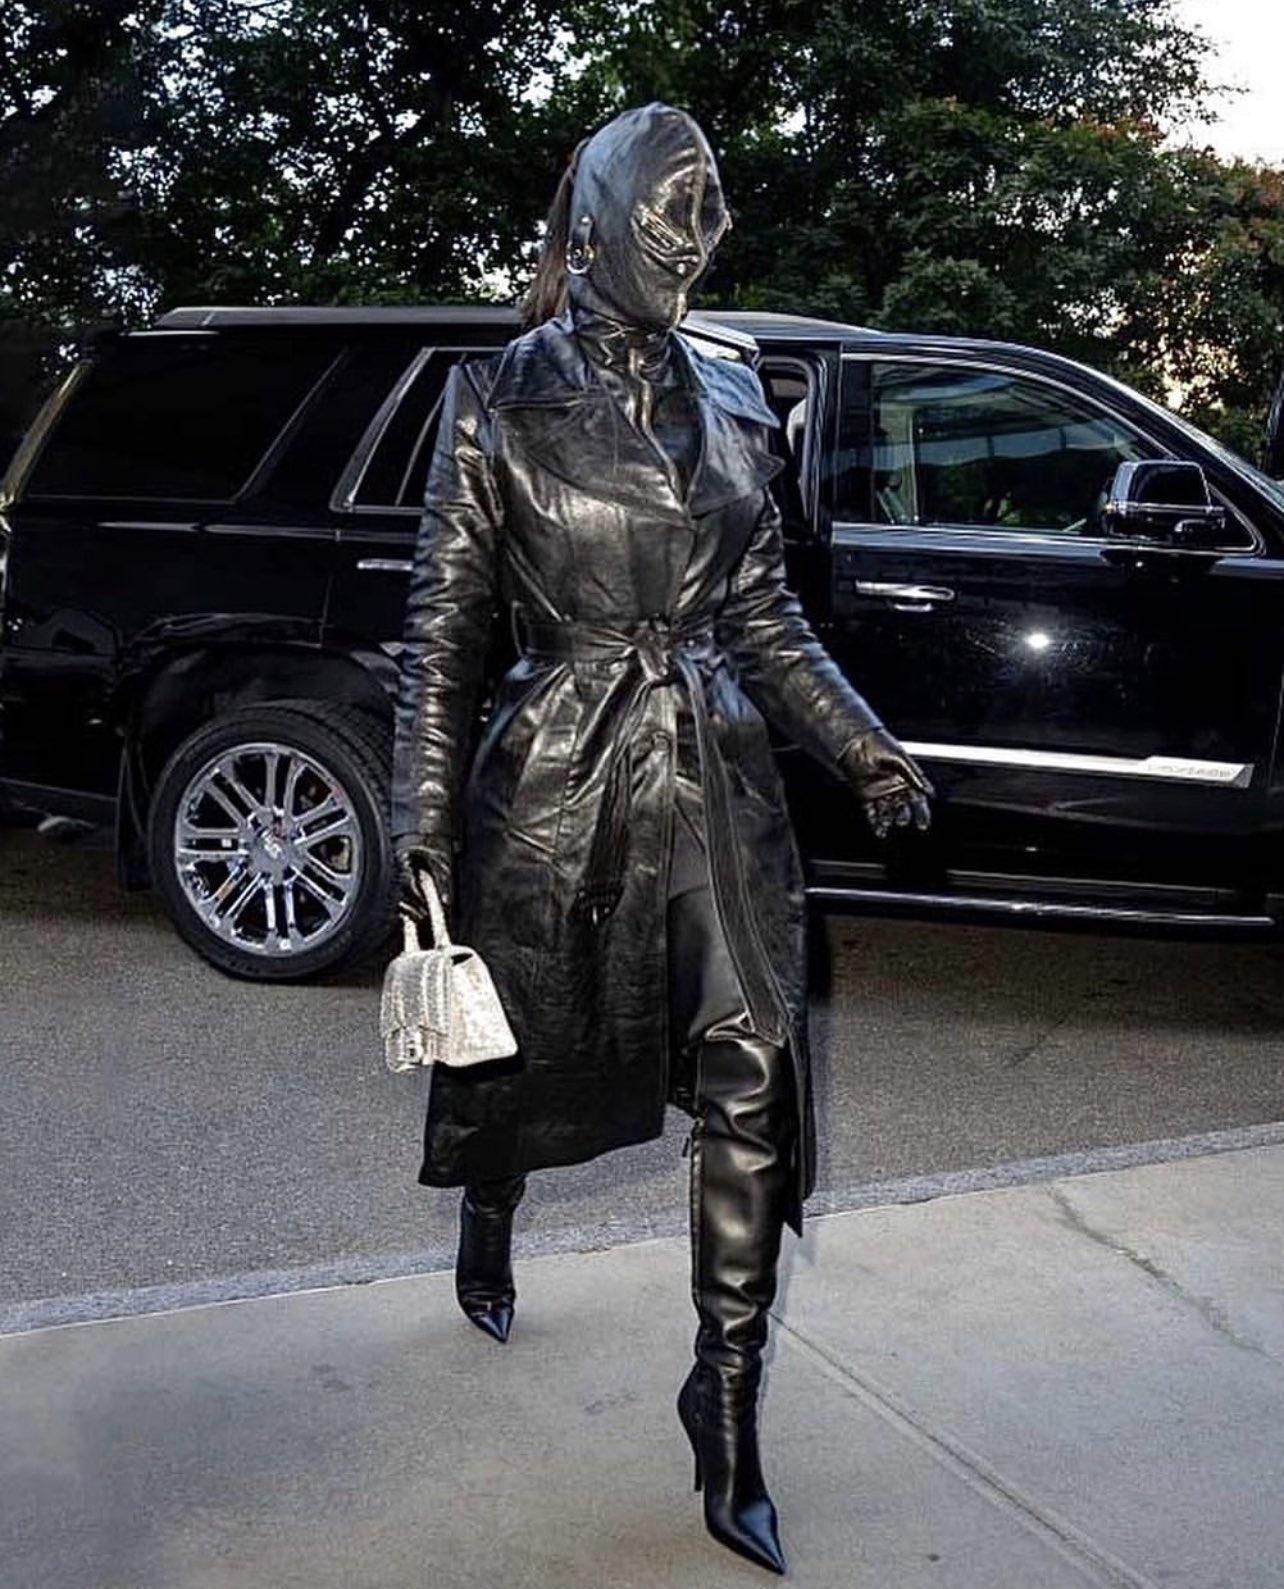 Kim Kardashian Rocks Head-to-Toe Leather Ensemble While Arriving in N.Y.C.